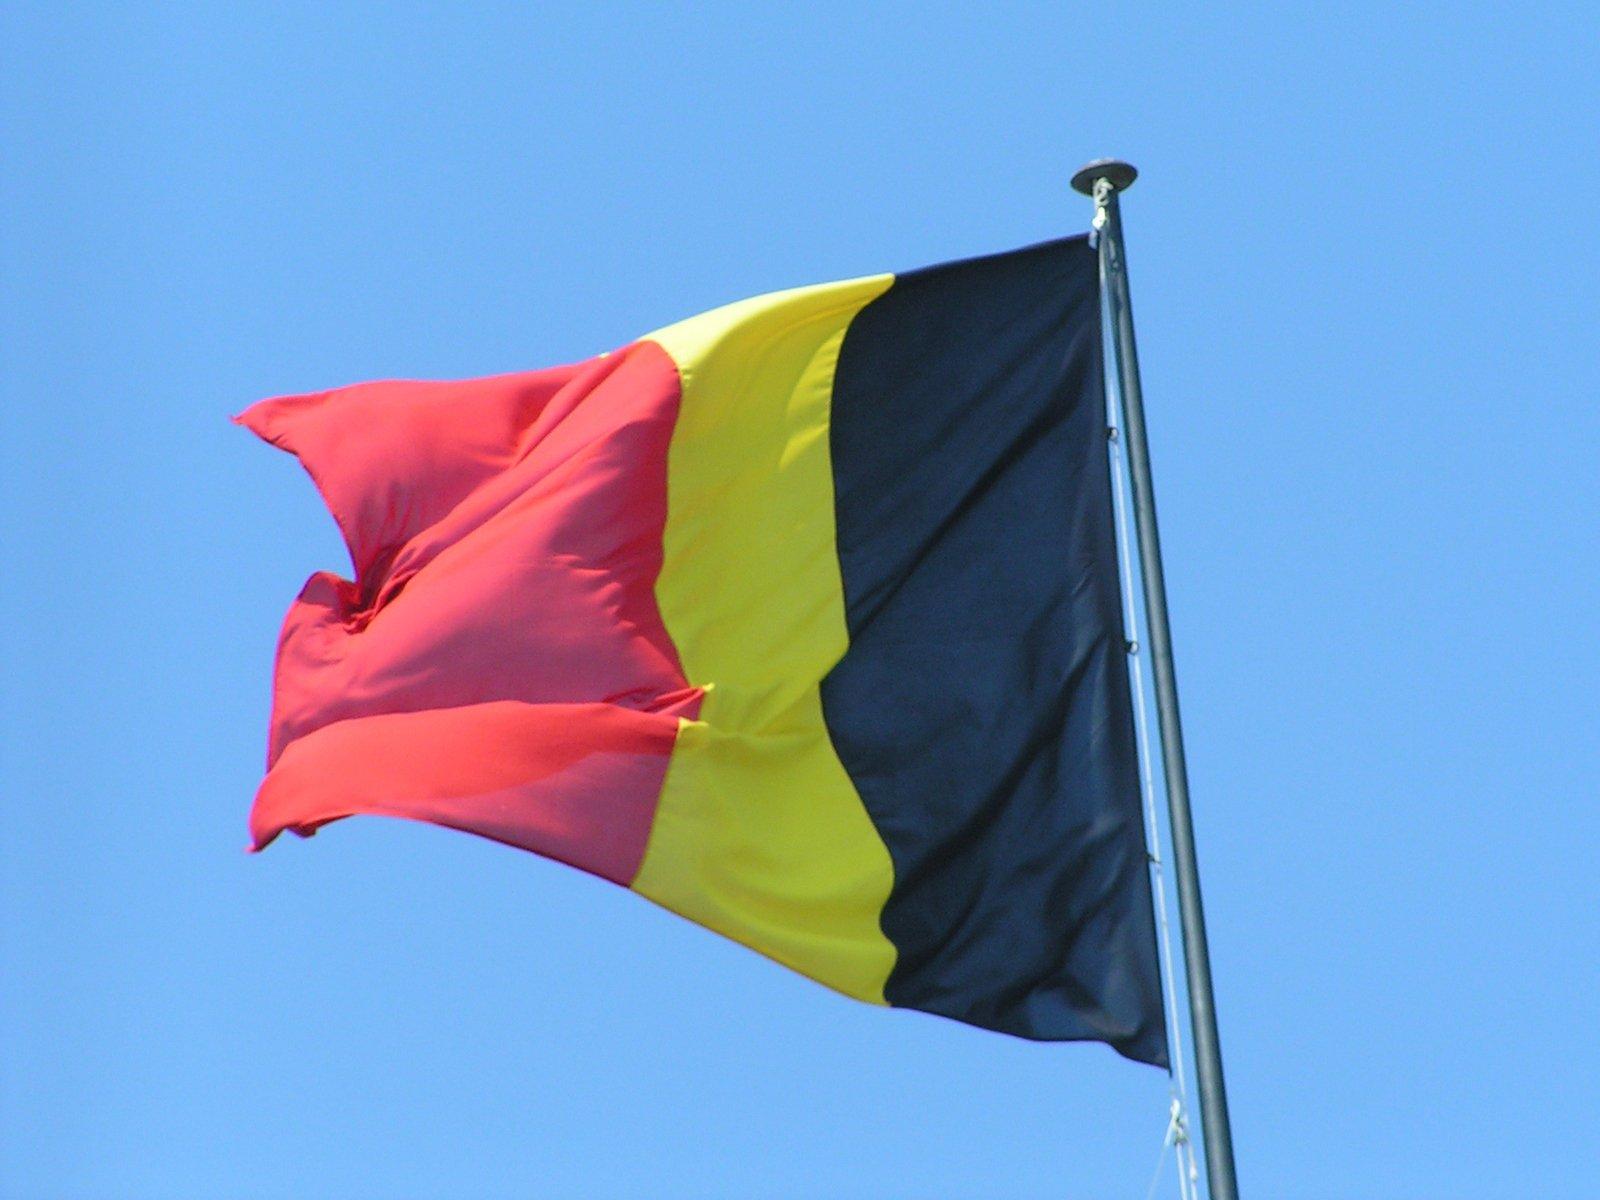 Also, the vertical design based on the france' flag. Belgian Flag | Belgium National Flag for Sale Online | UK